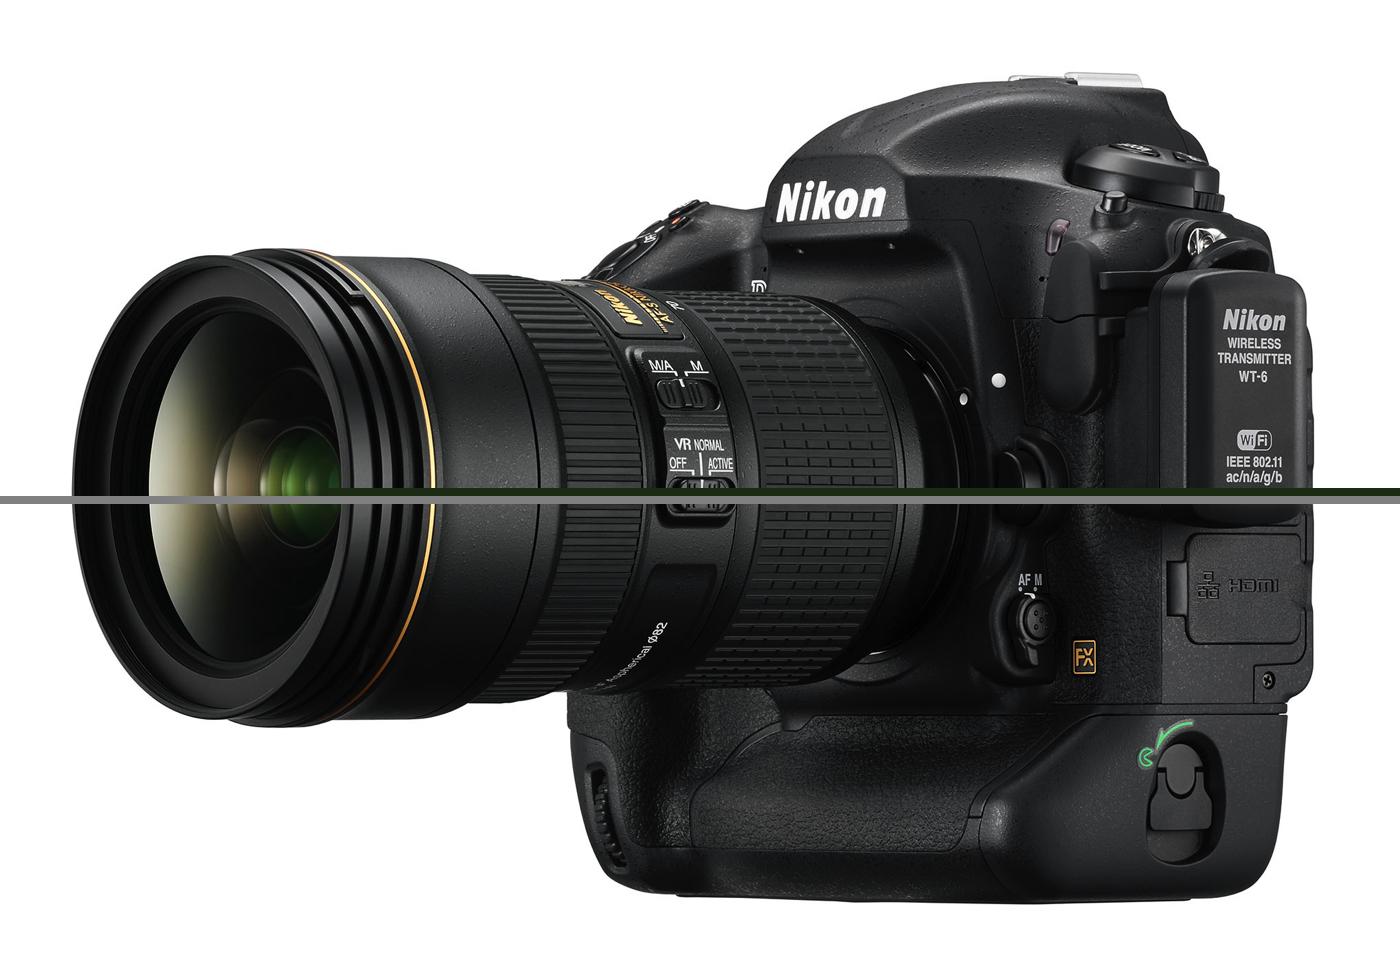 Nikon-D5 Nikon D5 Review News and Reviews